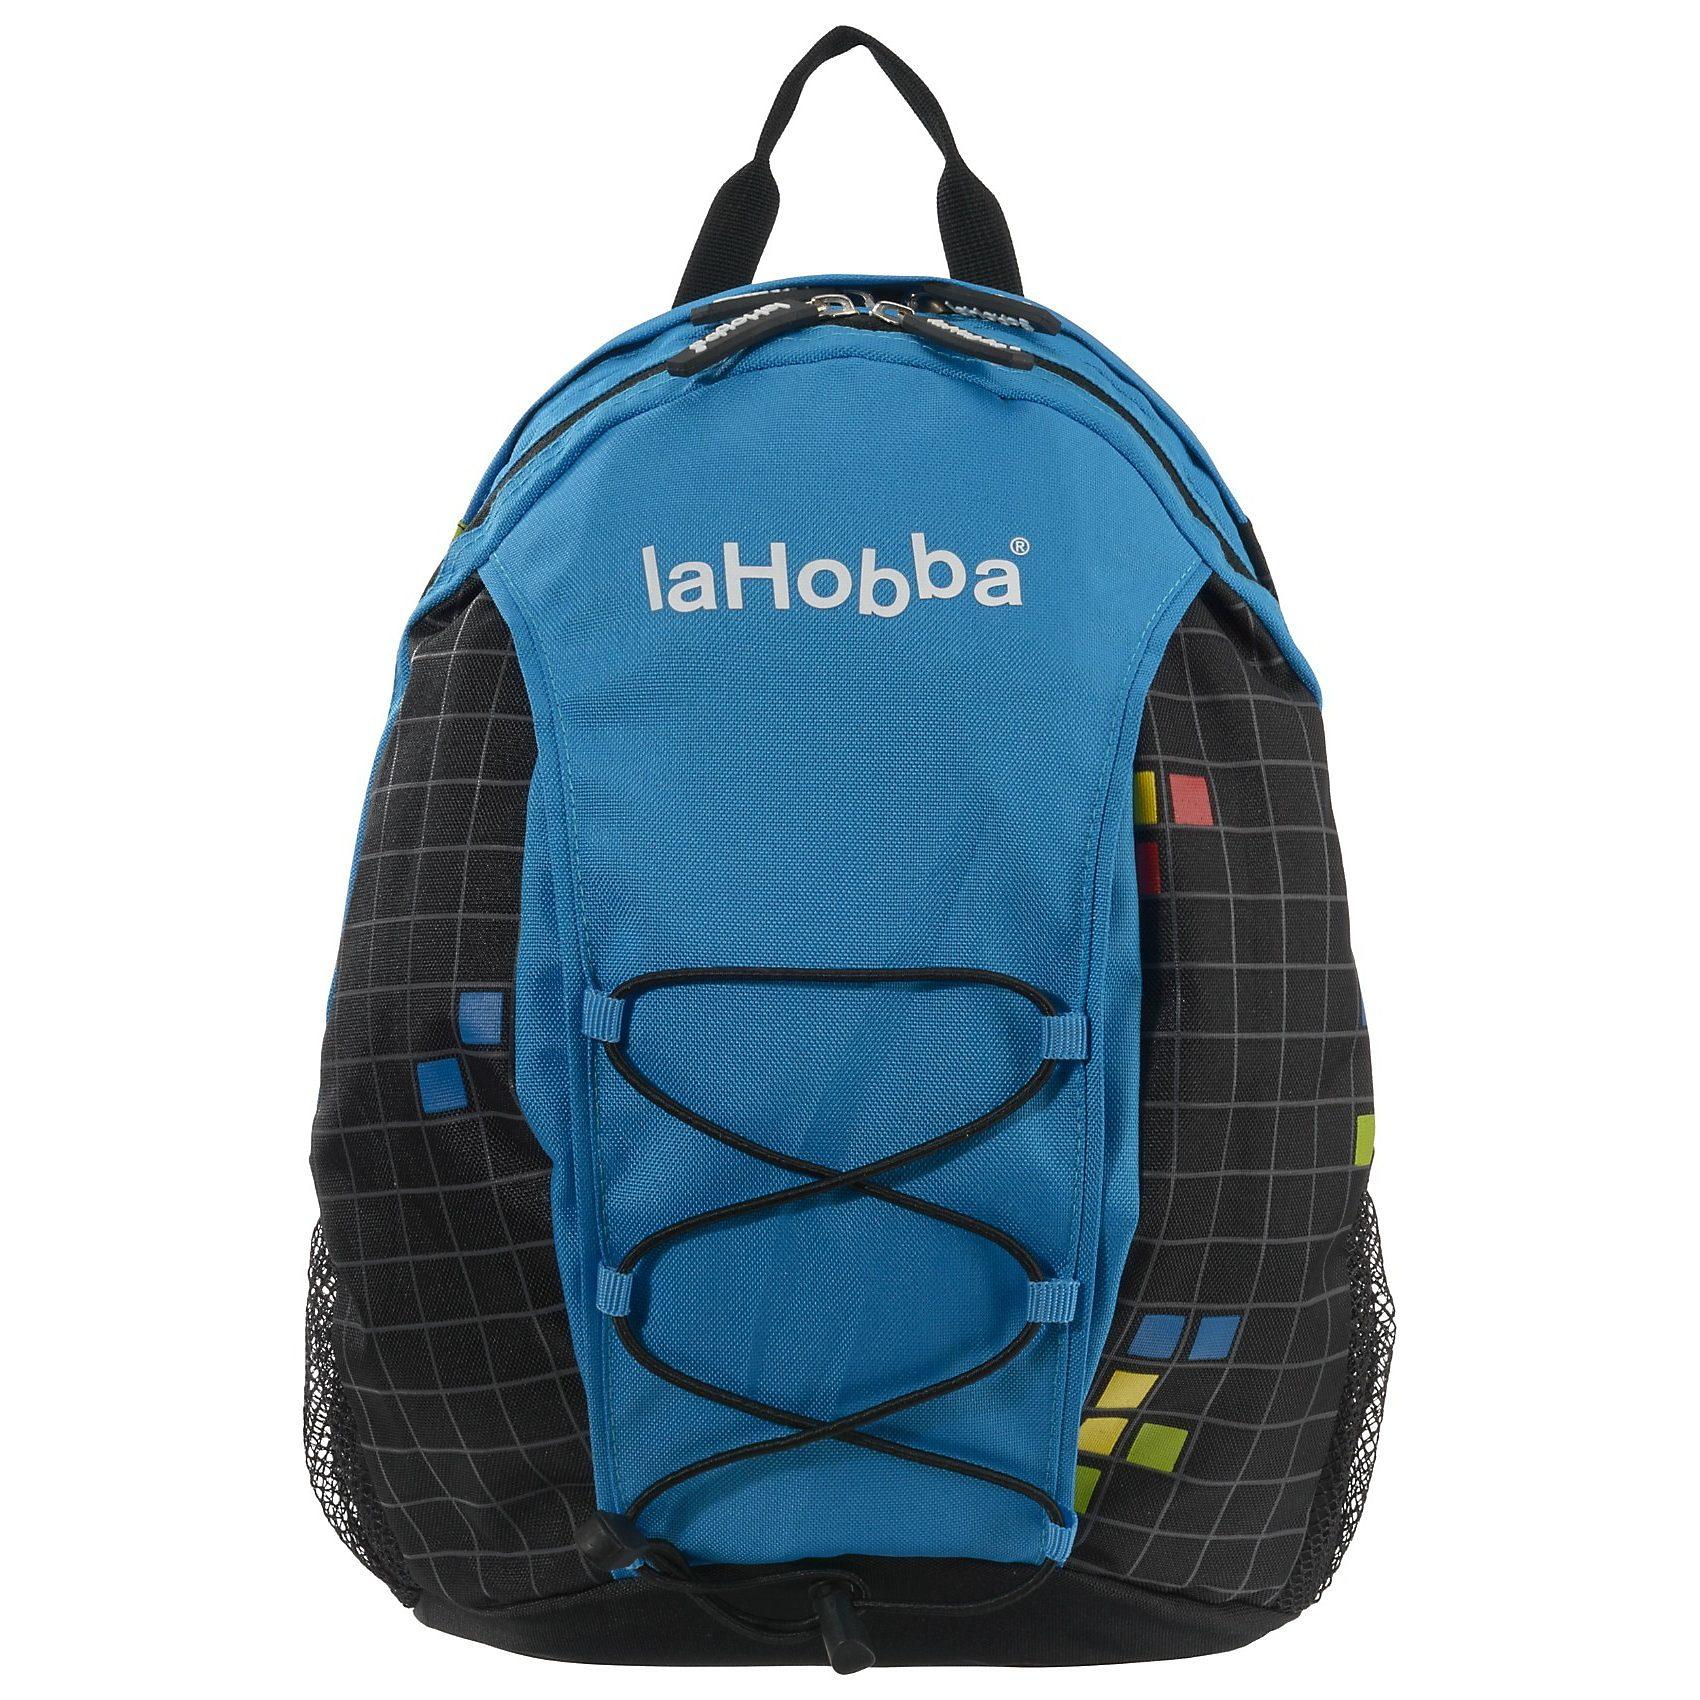 LaHobba Rucksack